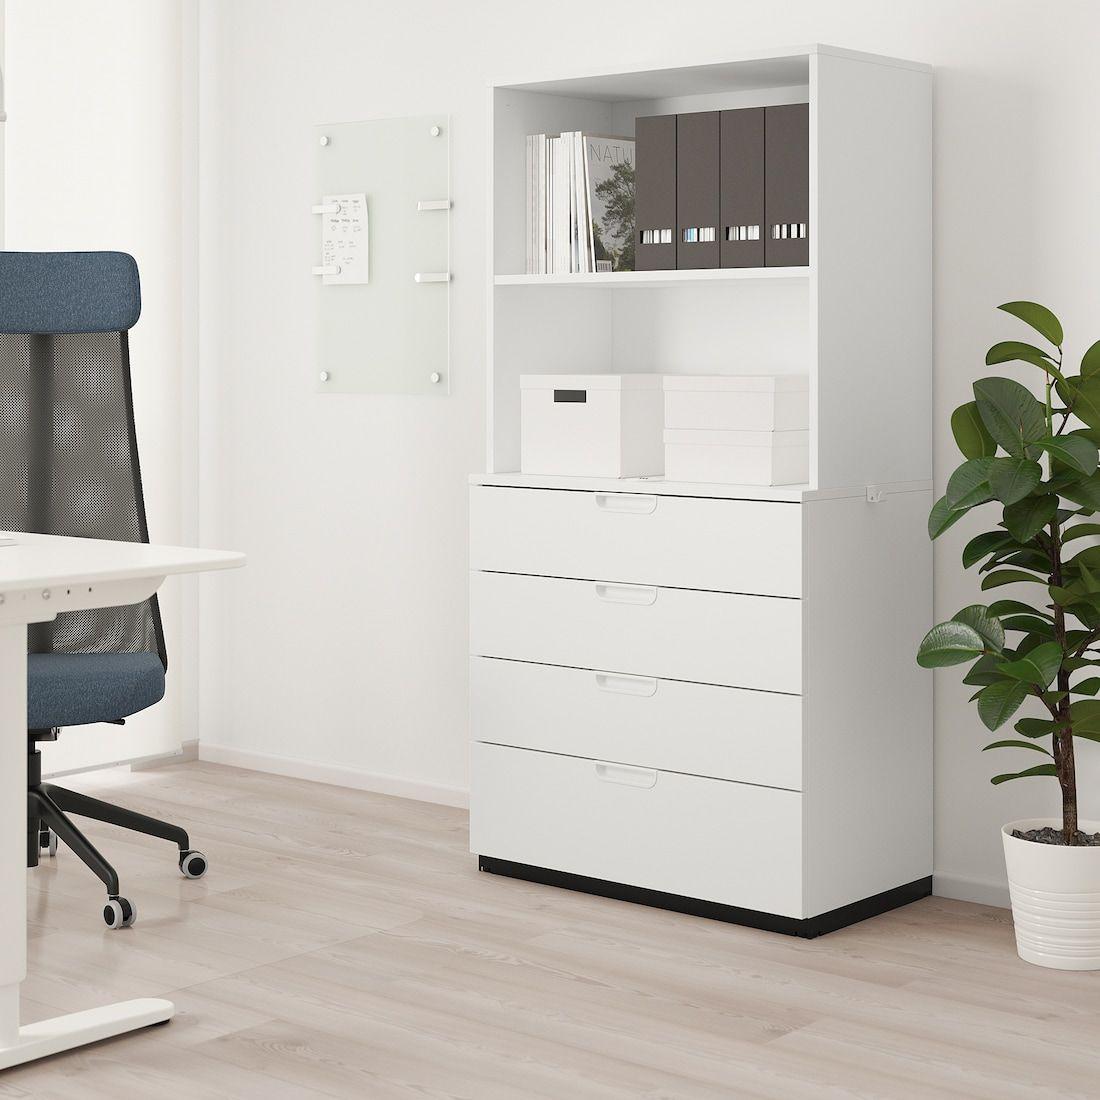 Galant White Storage Combination With Drawers 80x160 Cm Ikea Ikea Galant Ikea Storage